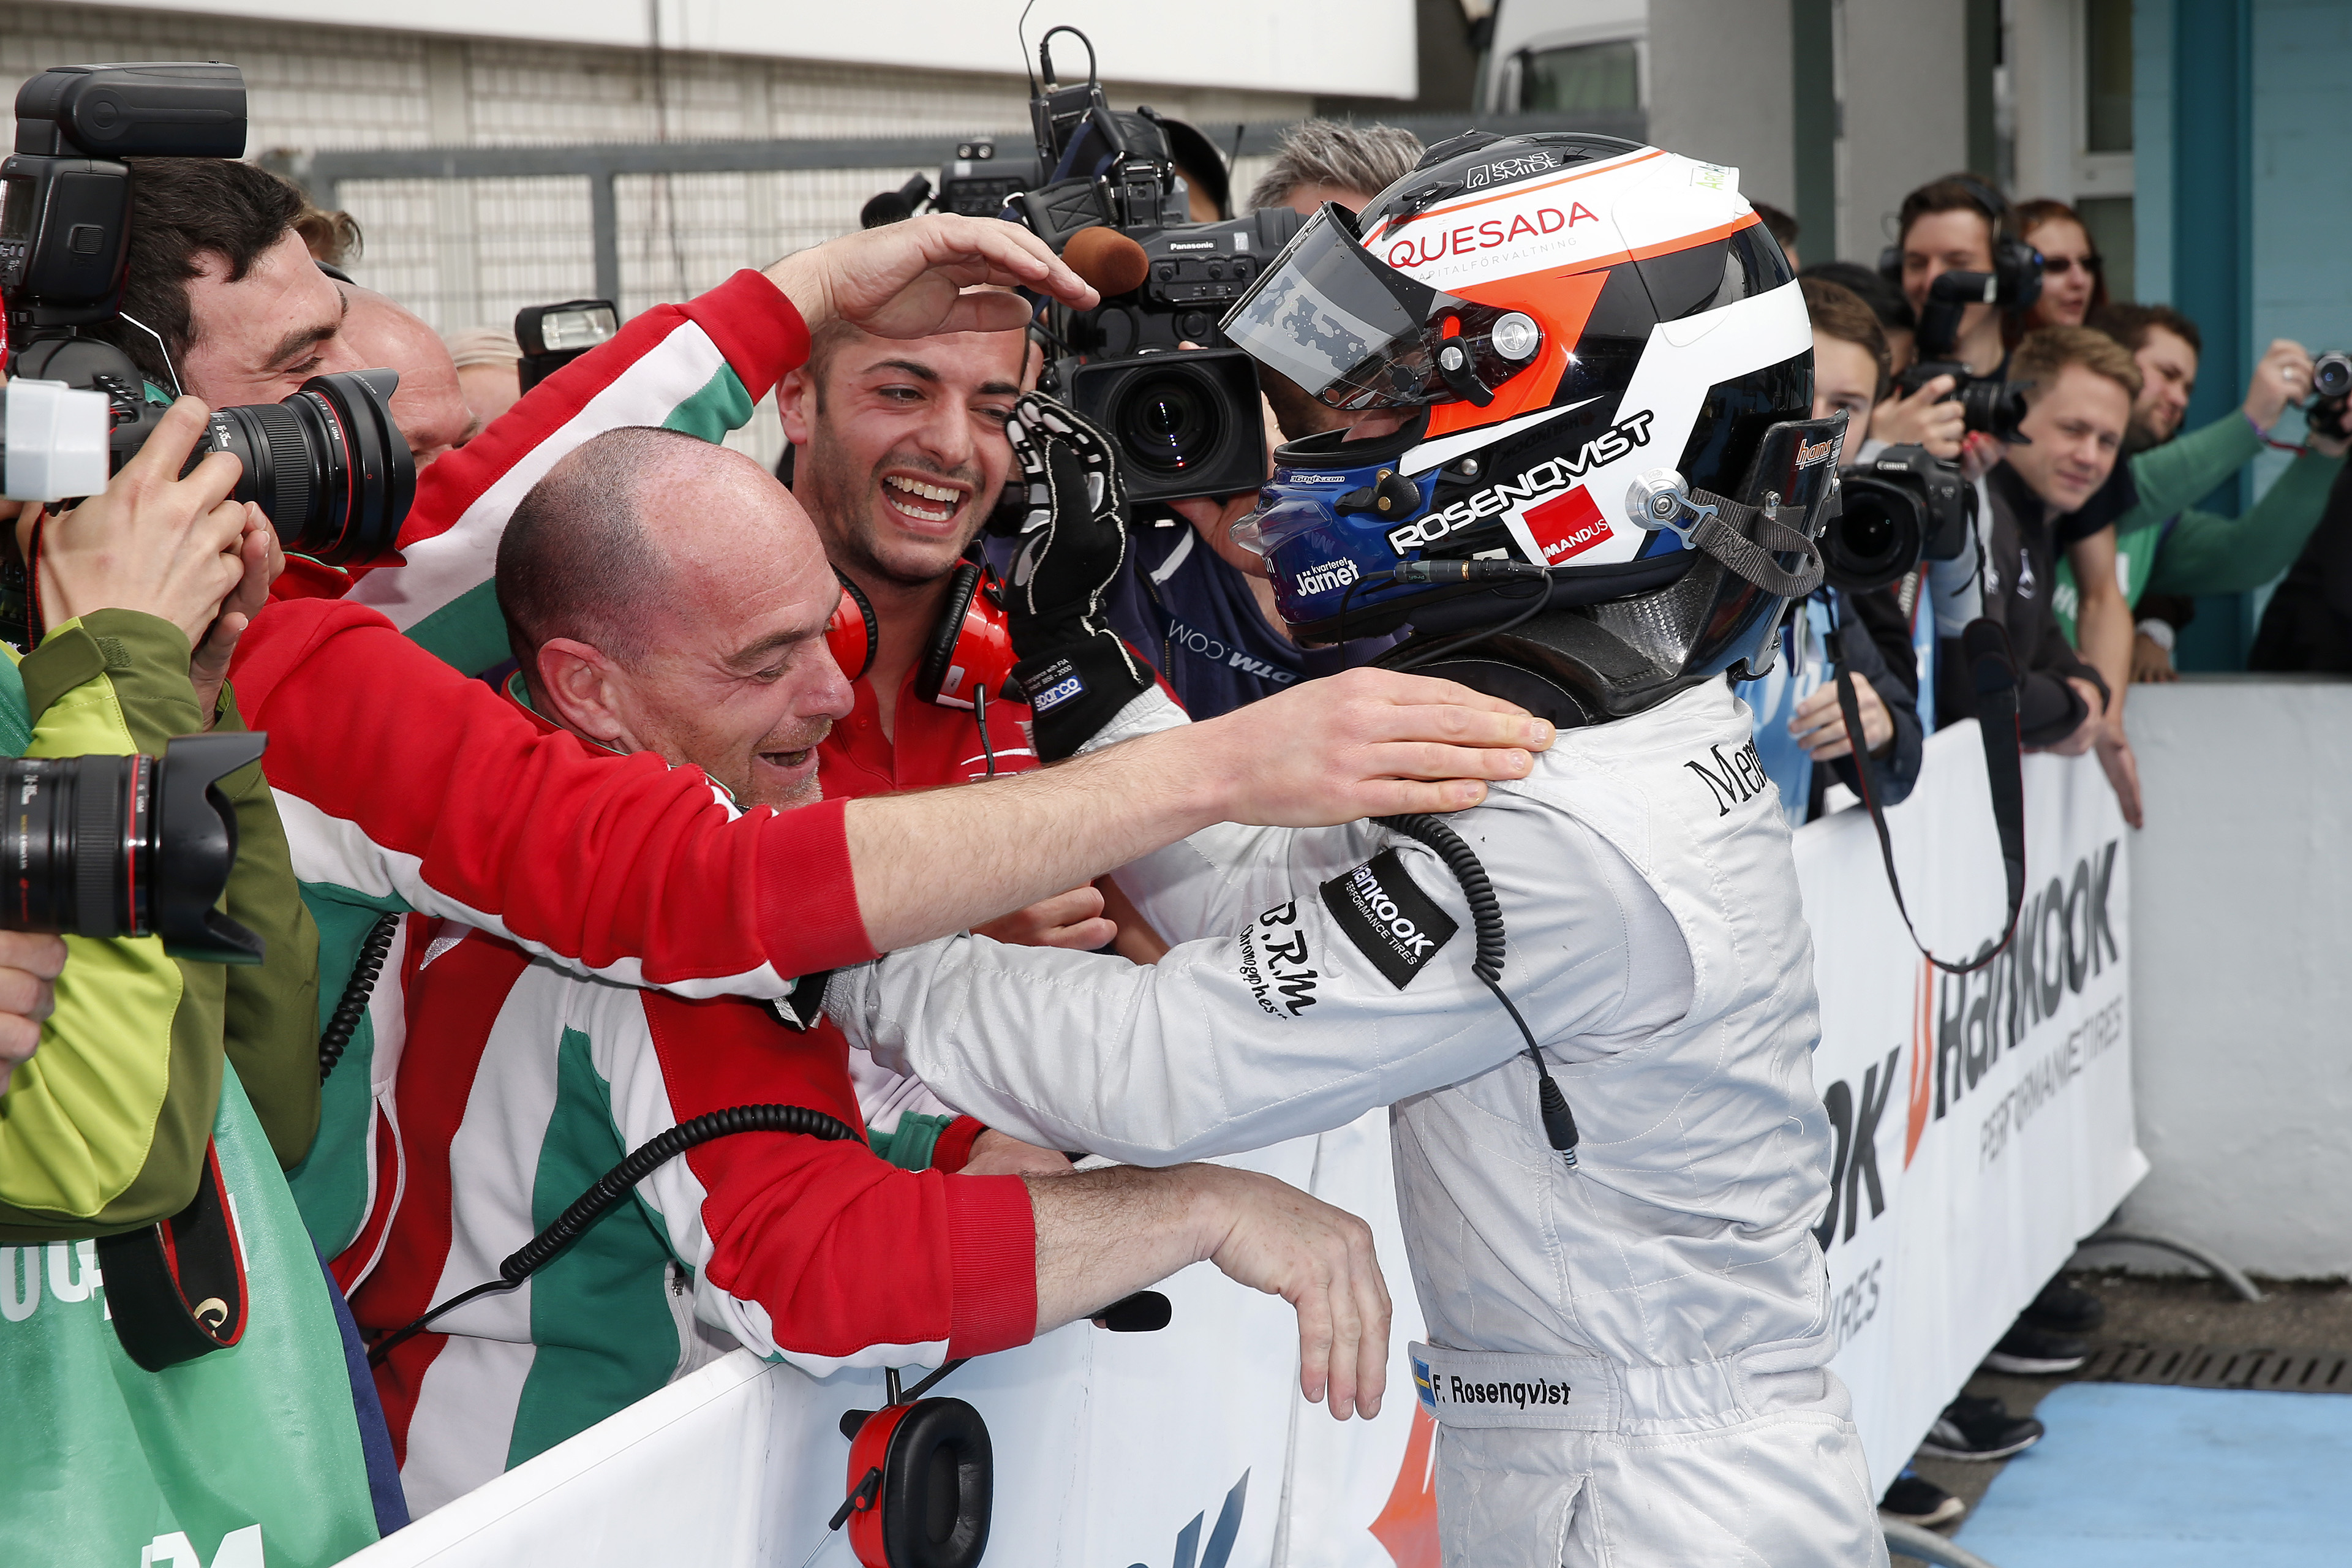 FIA Formula 3 European Championship, round 2, race 2, Hockenheim (GER)